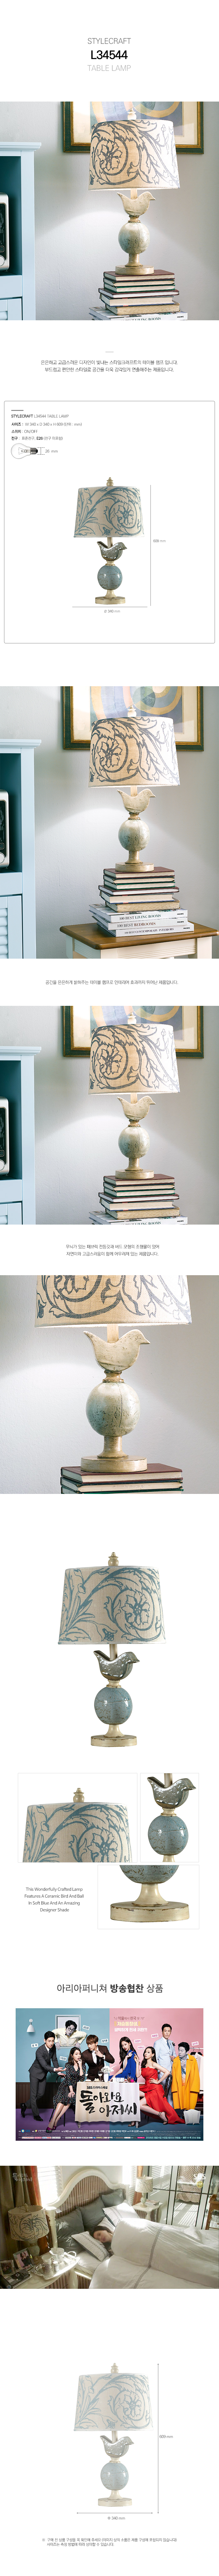 6_4_L34544_Lamp.jpg